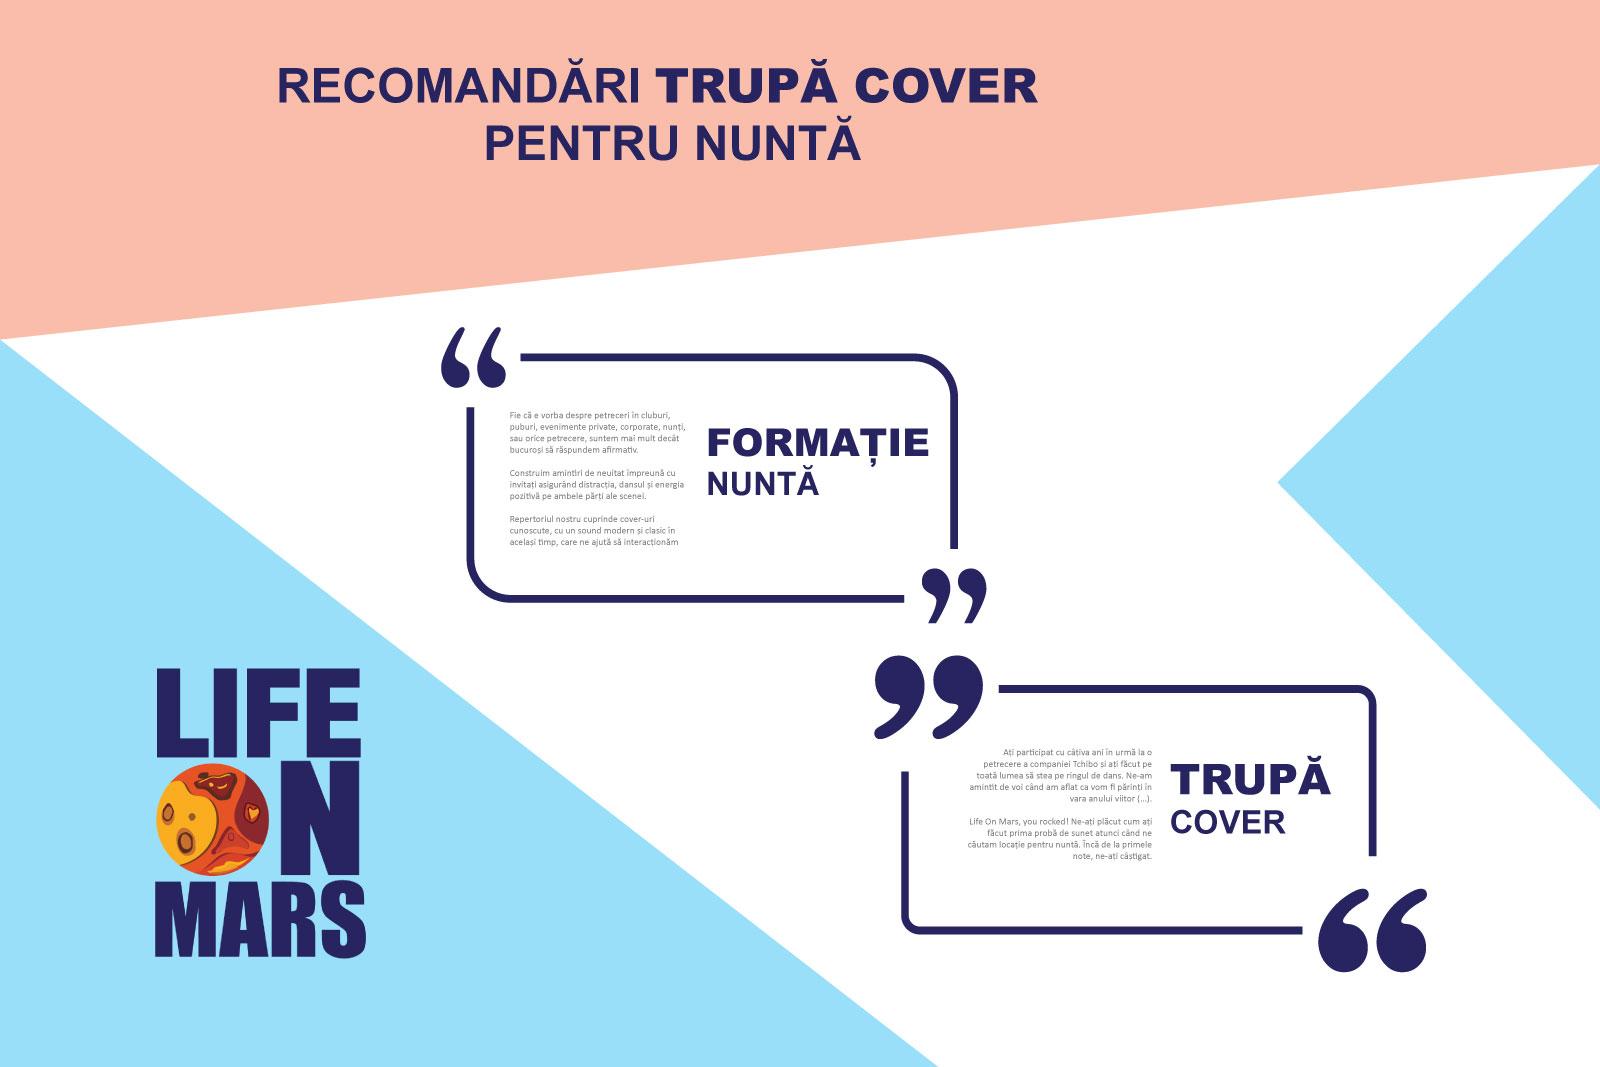 recomandari Formatie nunta, trupa cover